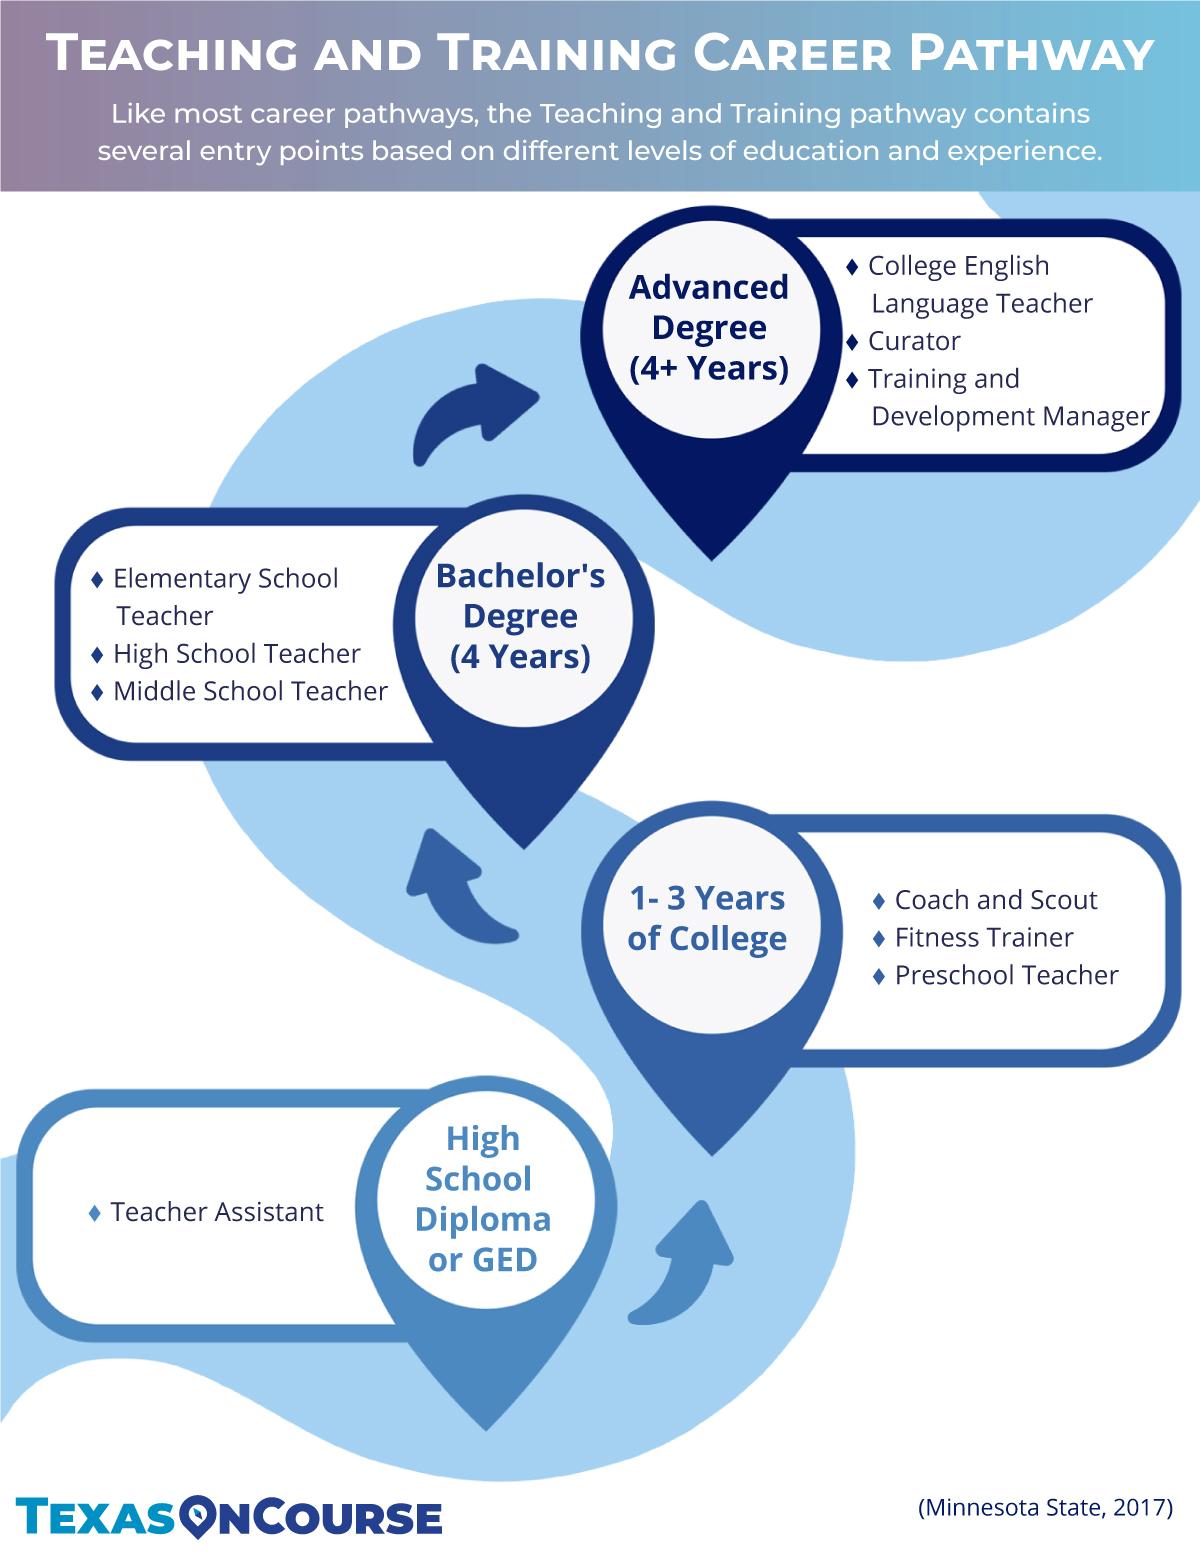 Teaching and Training Career Pathway